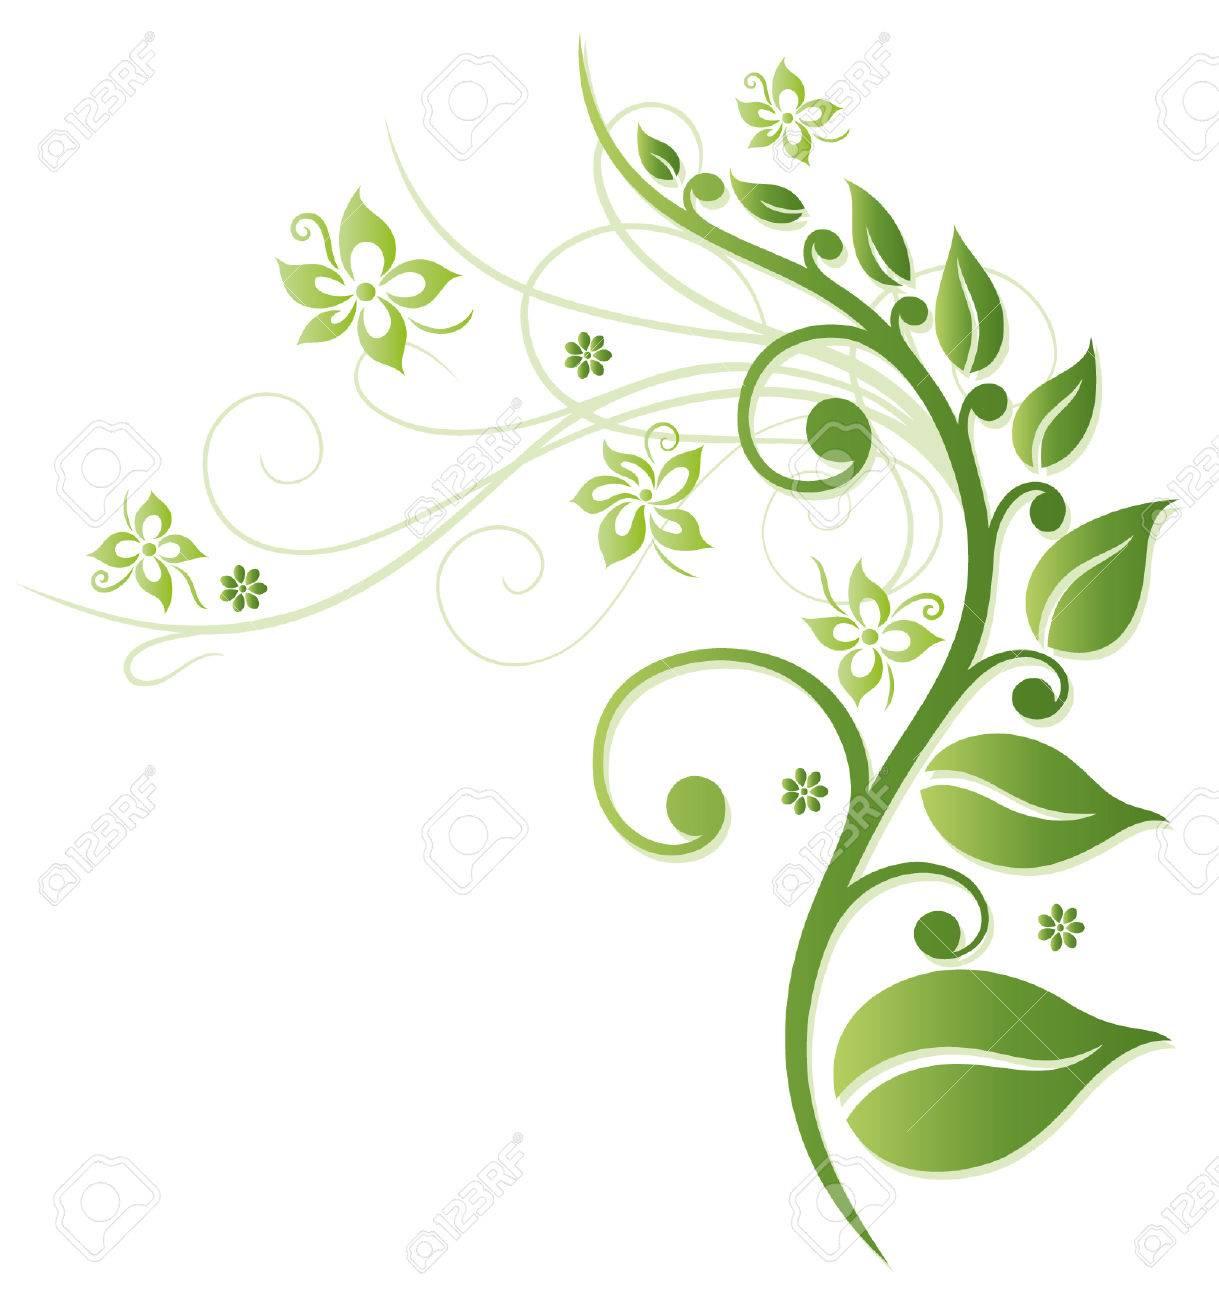 Green flowers, colorful spring time Standard-Bild - 23898854